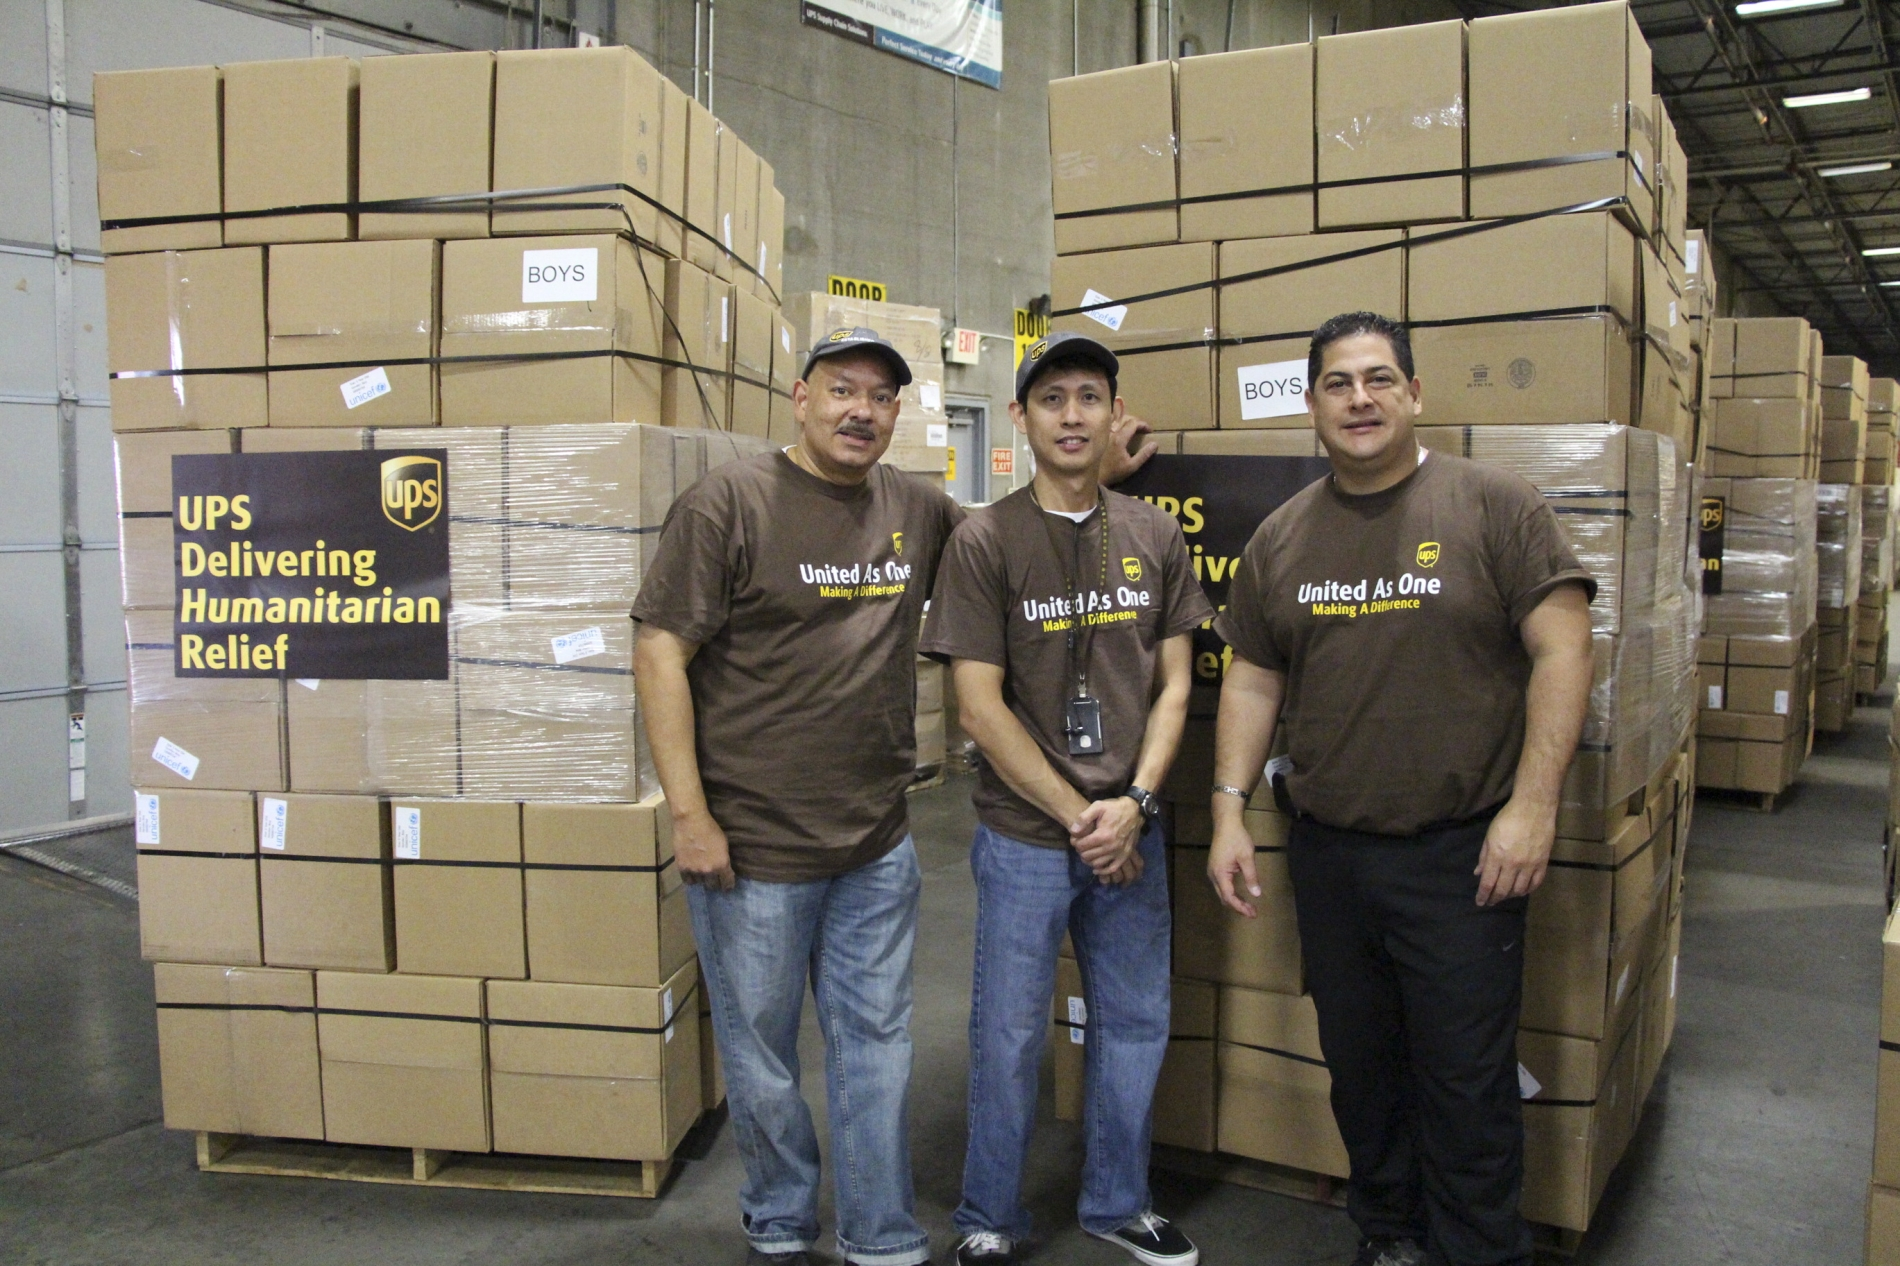 Donará UPS 1 mdd para recuperación de Texas y Louisiana tras huracán Harvey